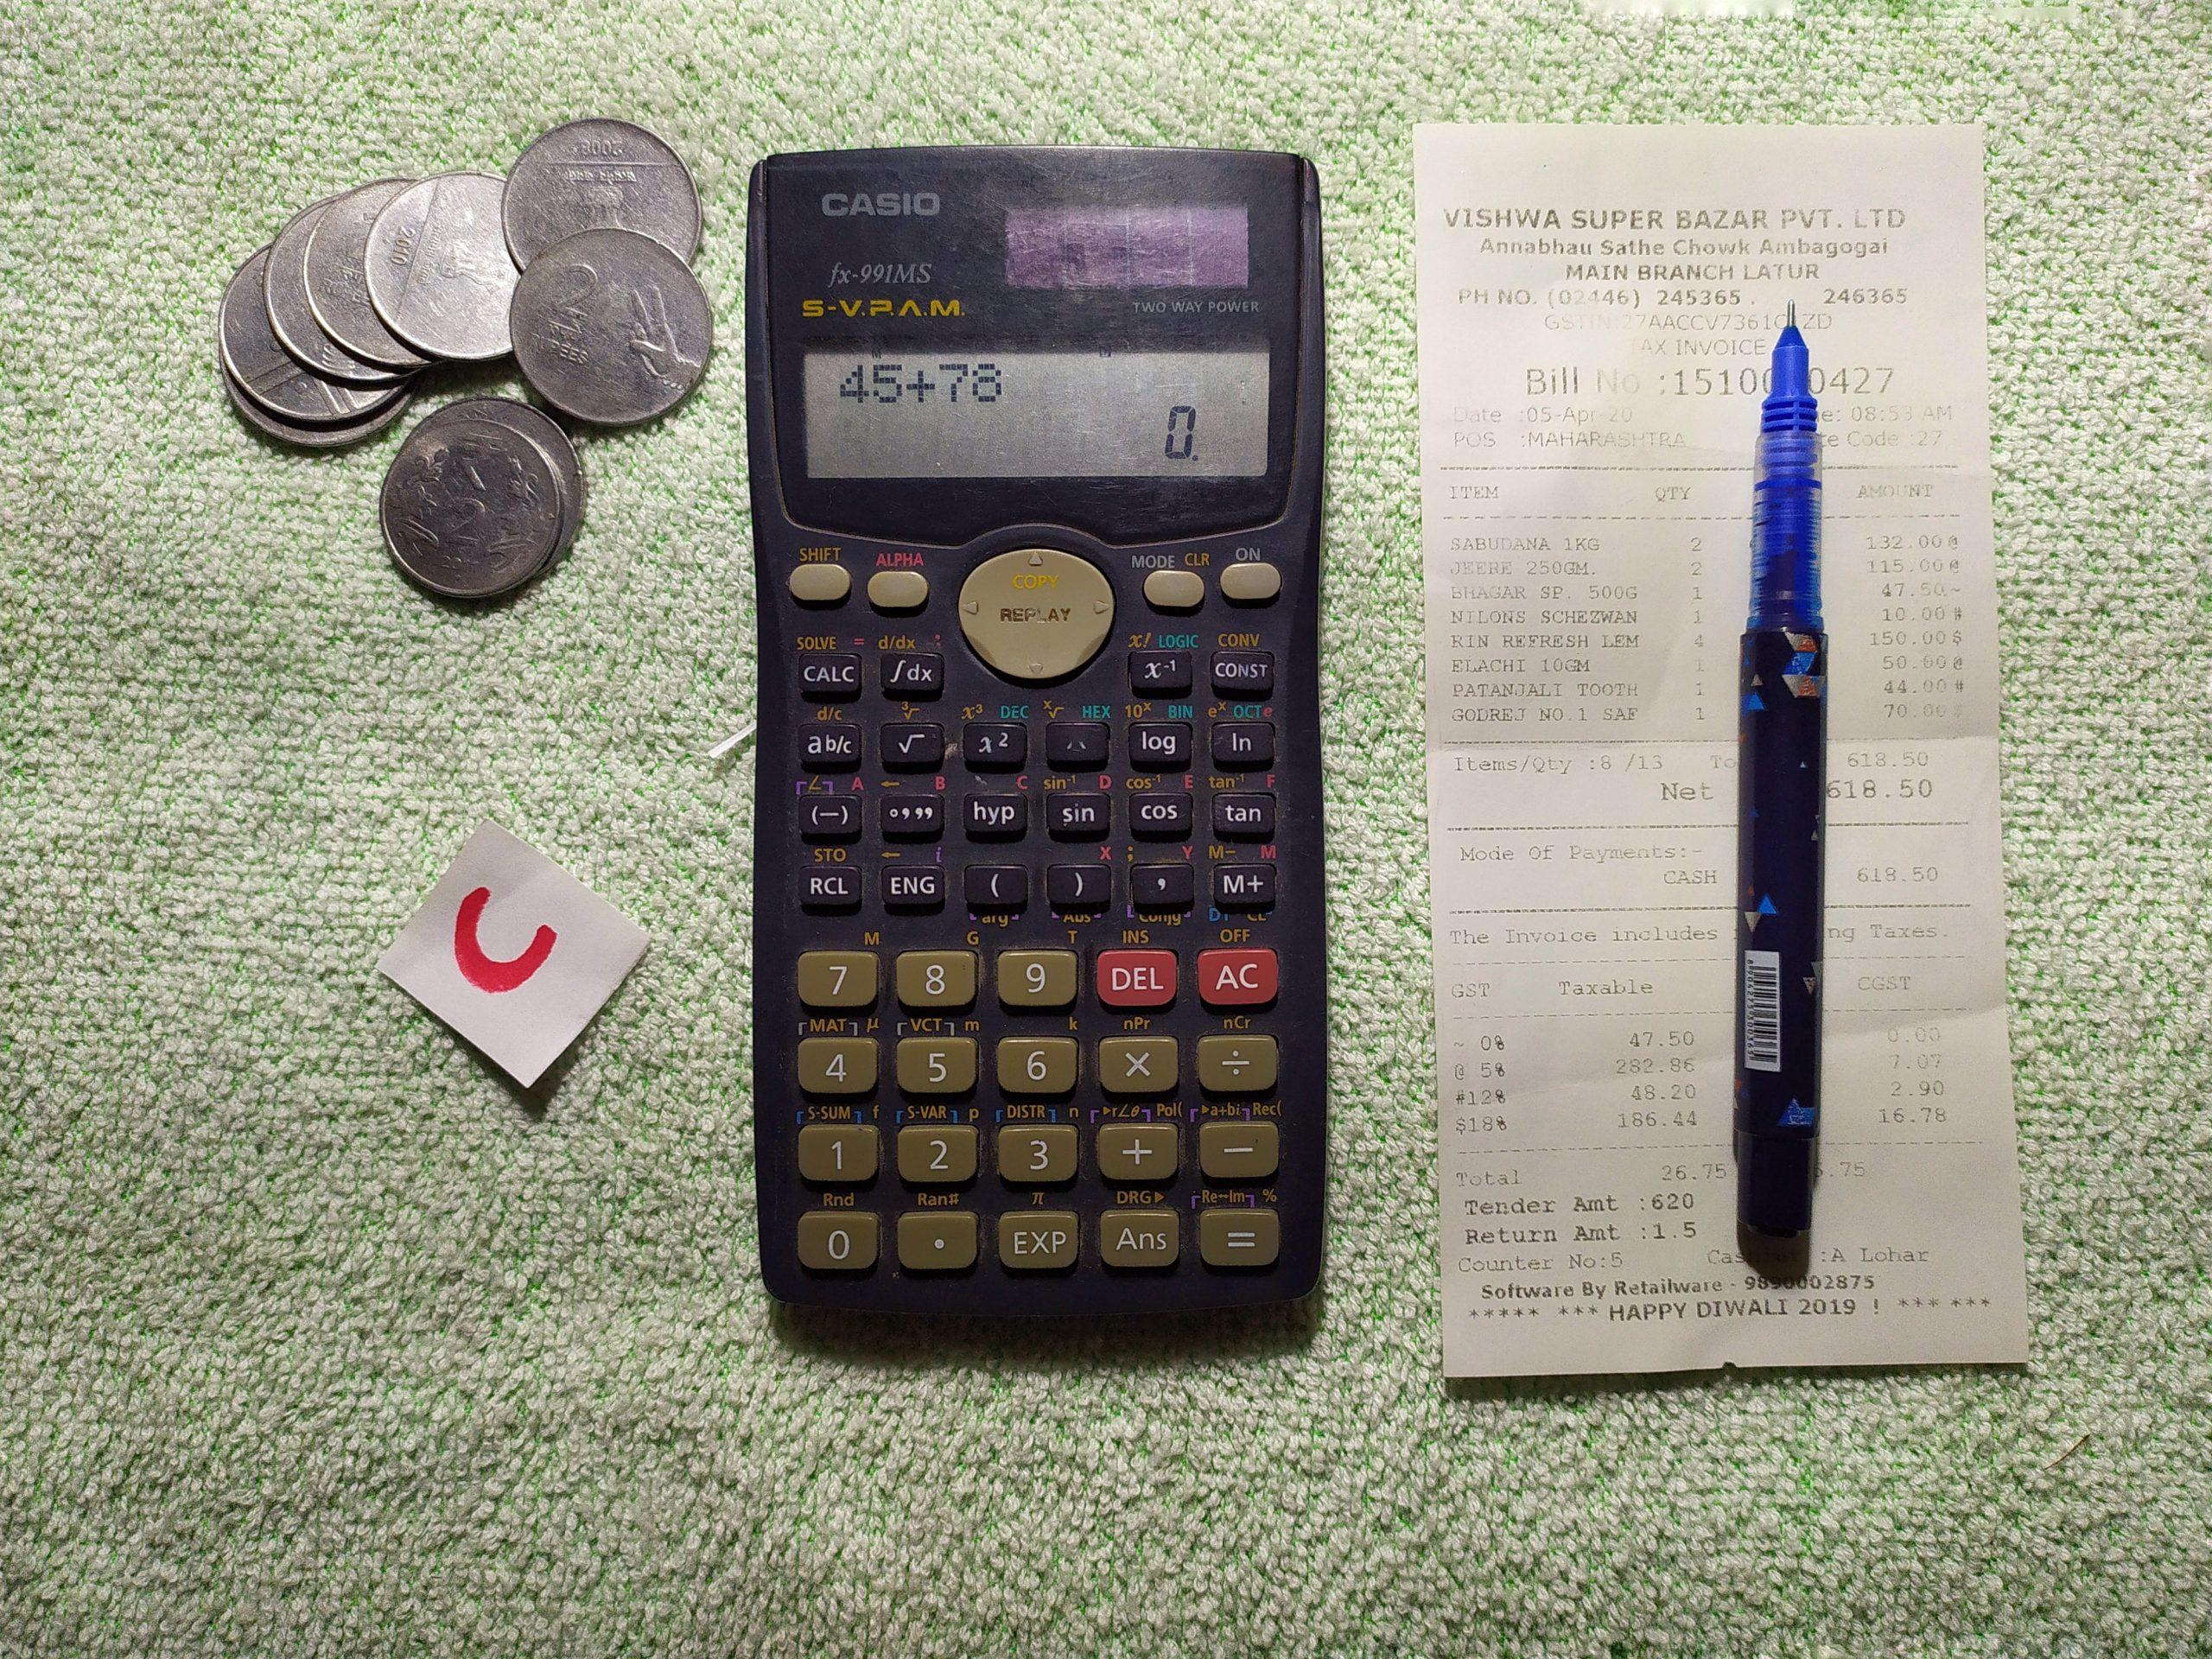 Calculating customer bill